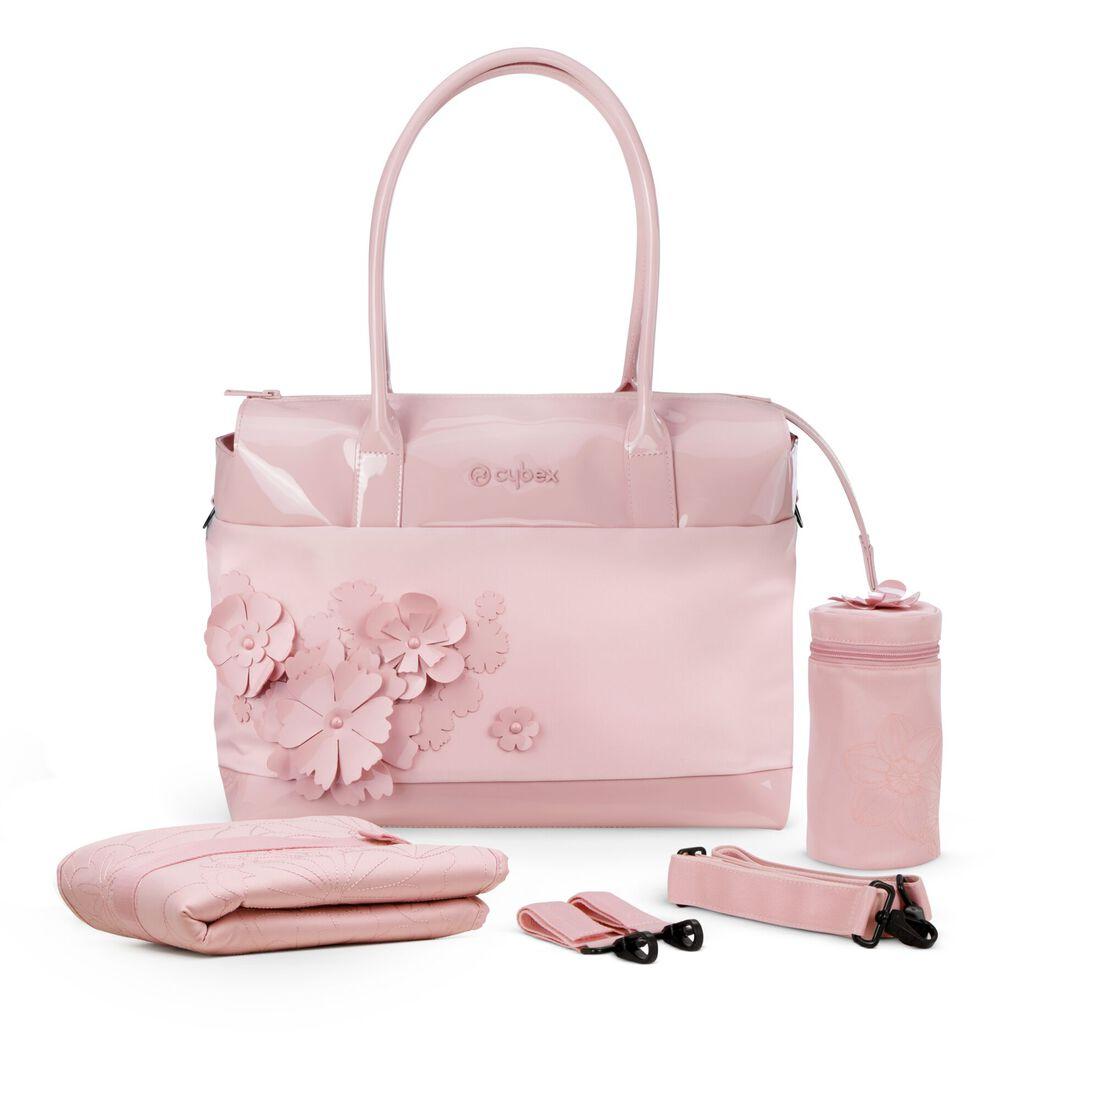 CYBEX Wickeltasche Simply Flowers - Pink in Pale Blush large Bild 3